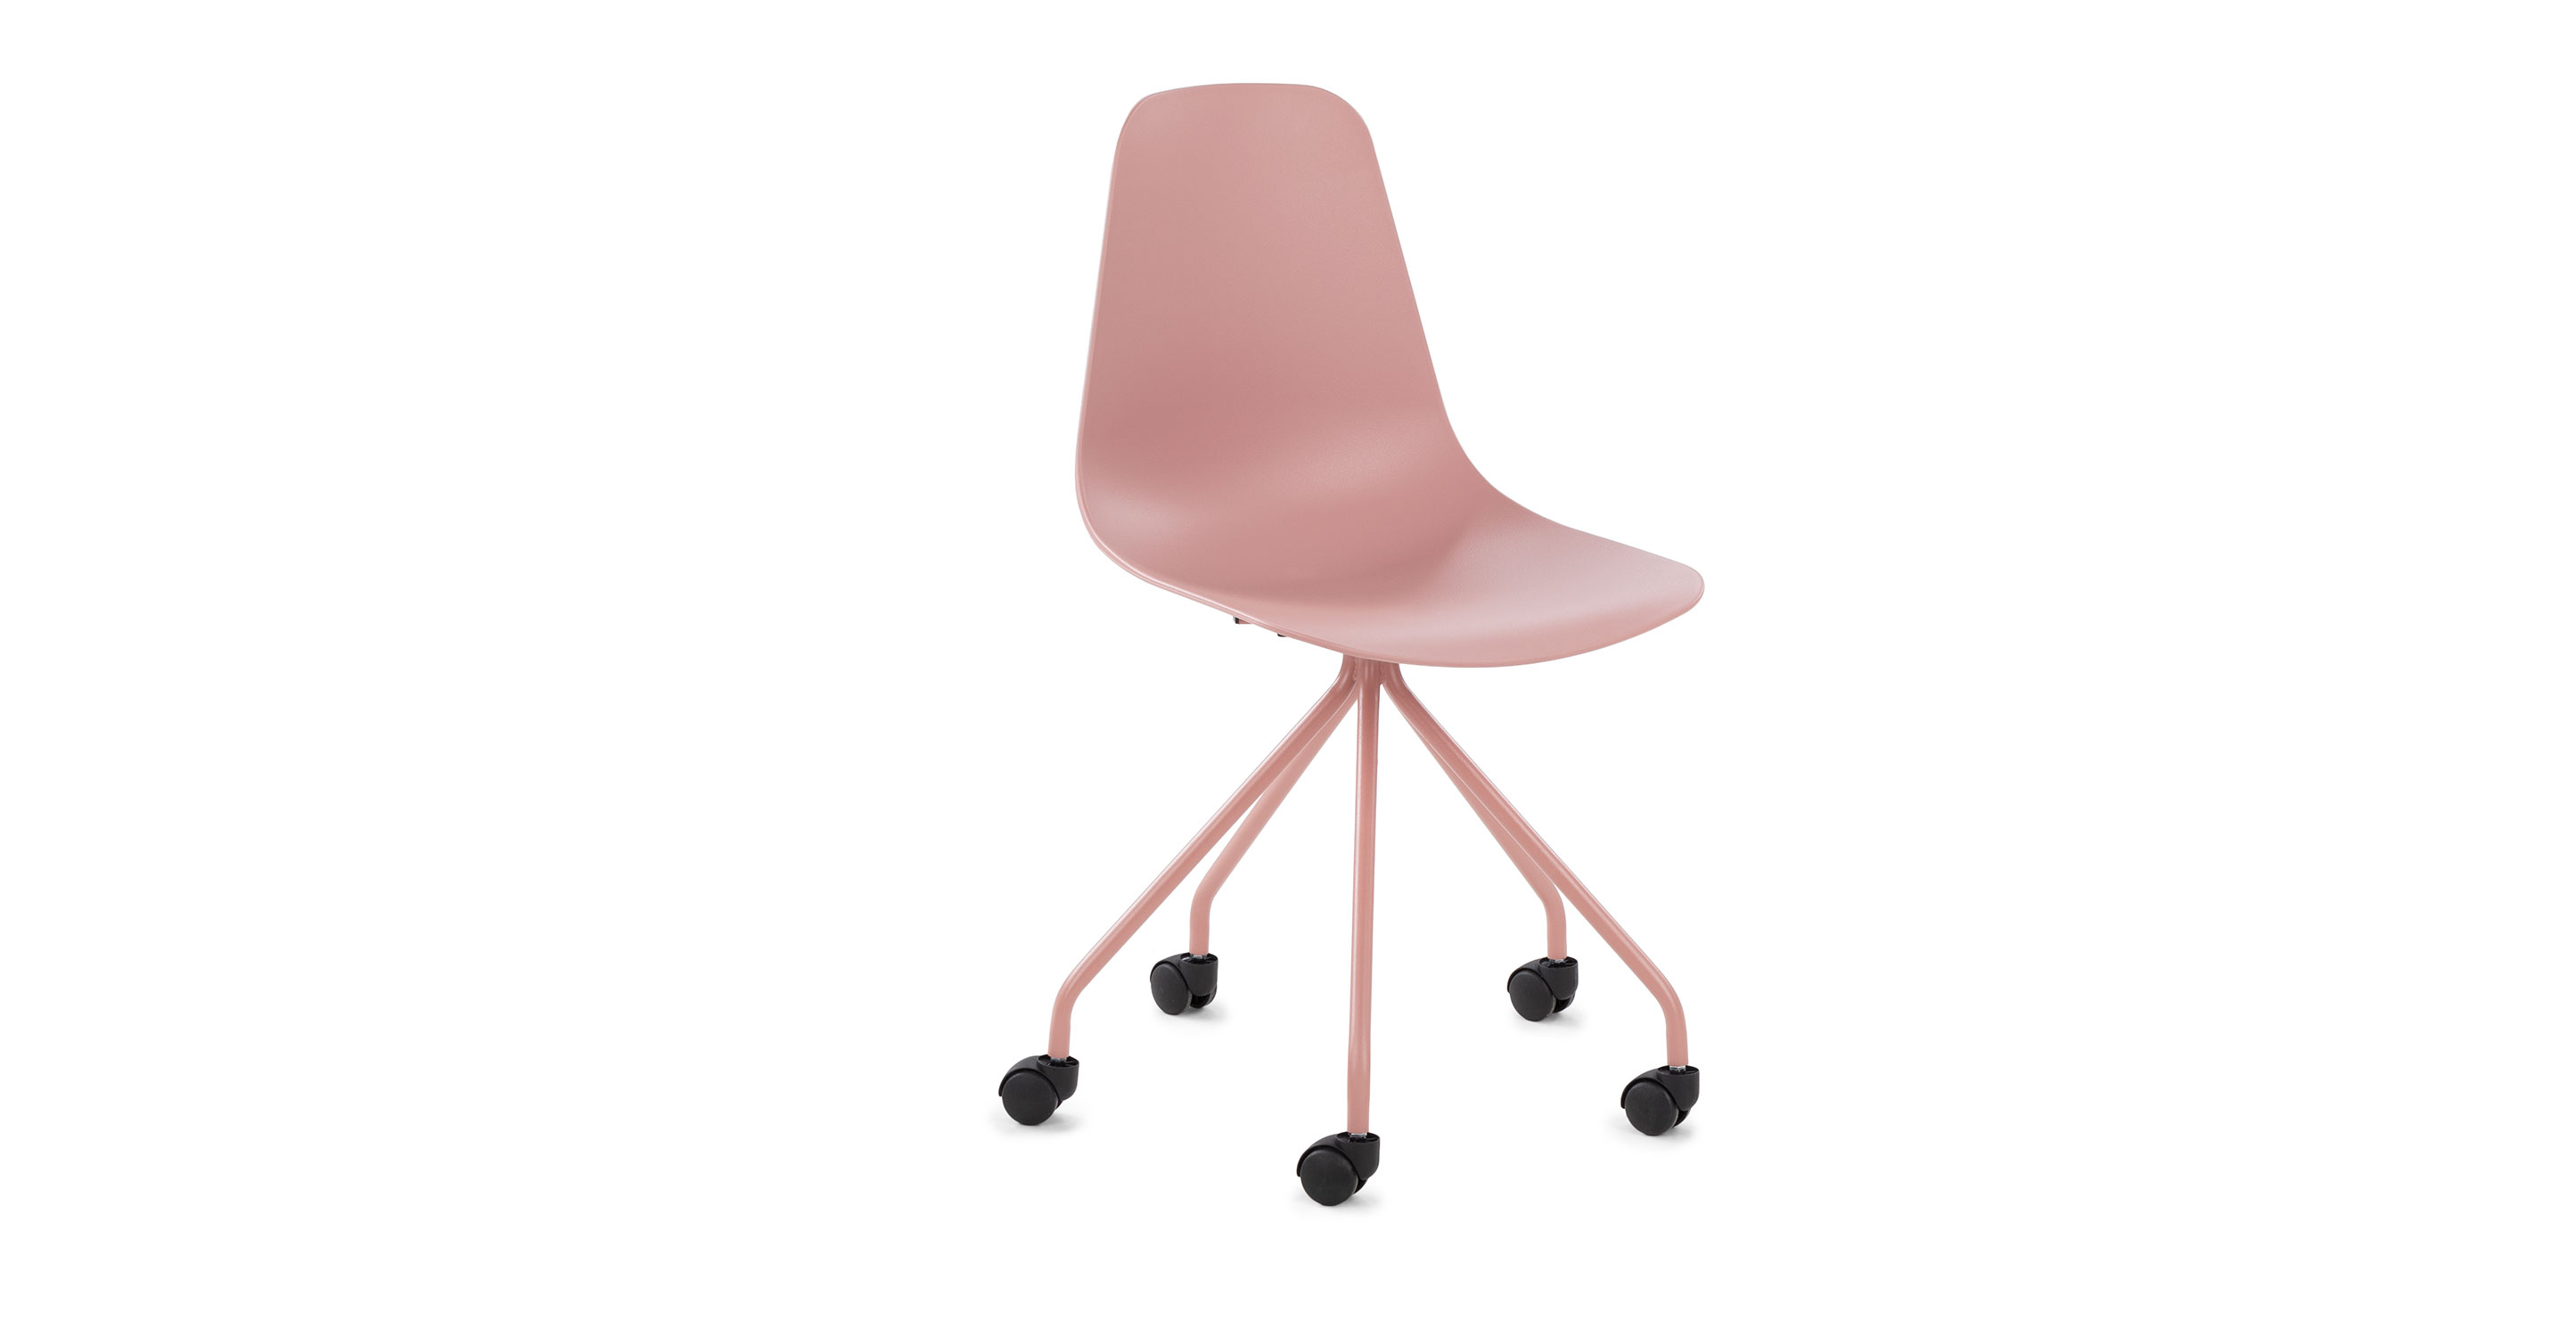 Dusty Pink Polypropylene Armless Office Chair Svelti Article